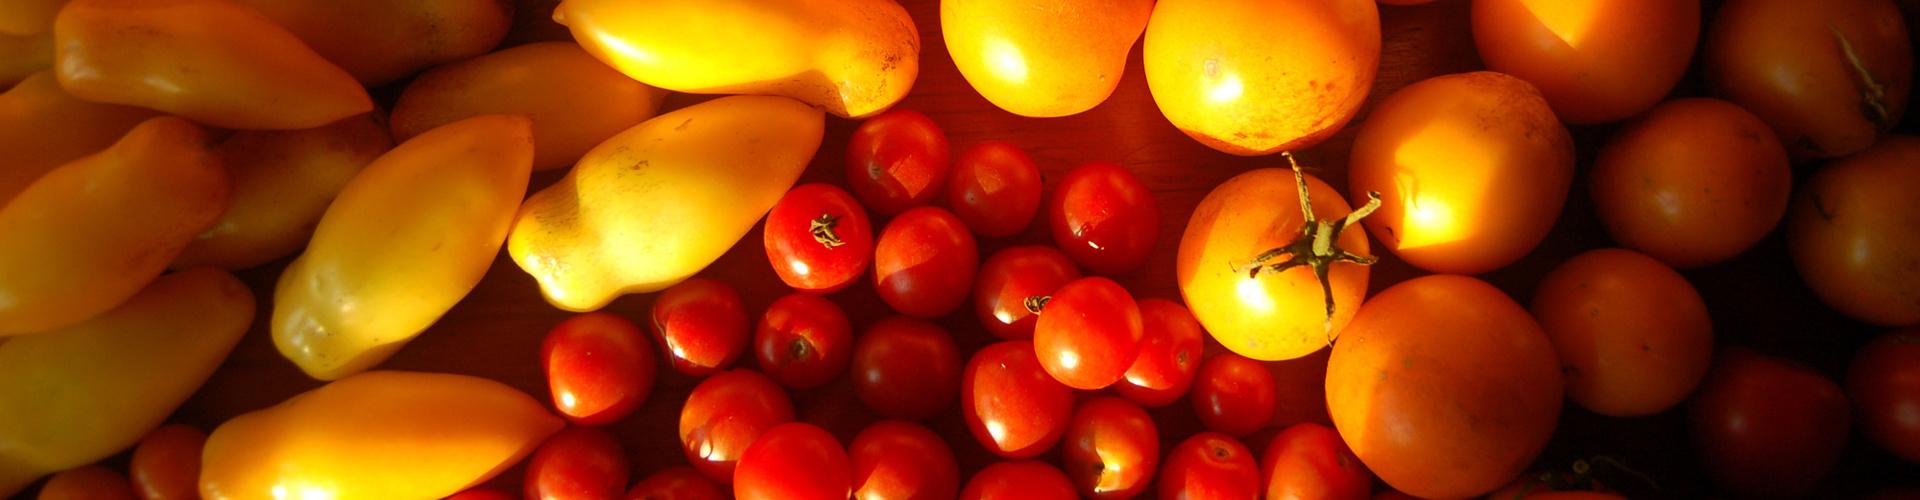 etale-tomates-1